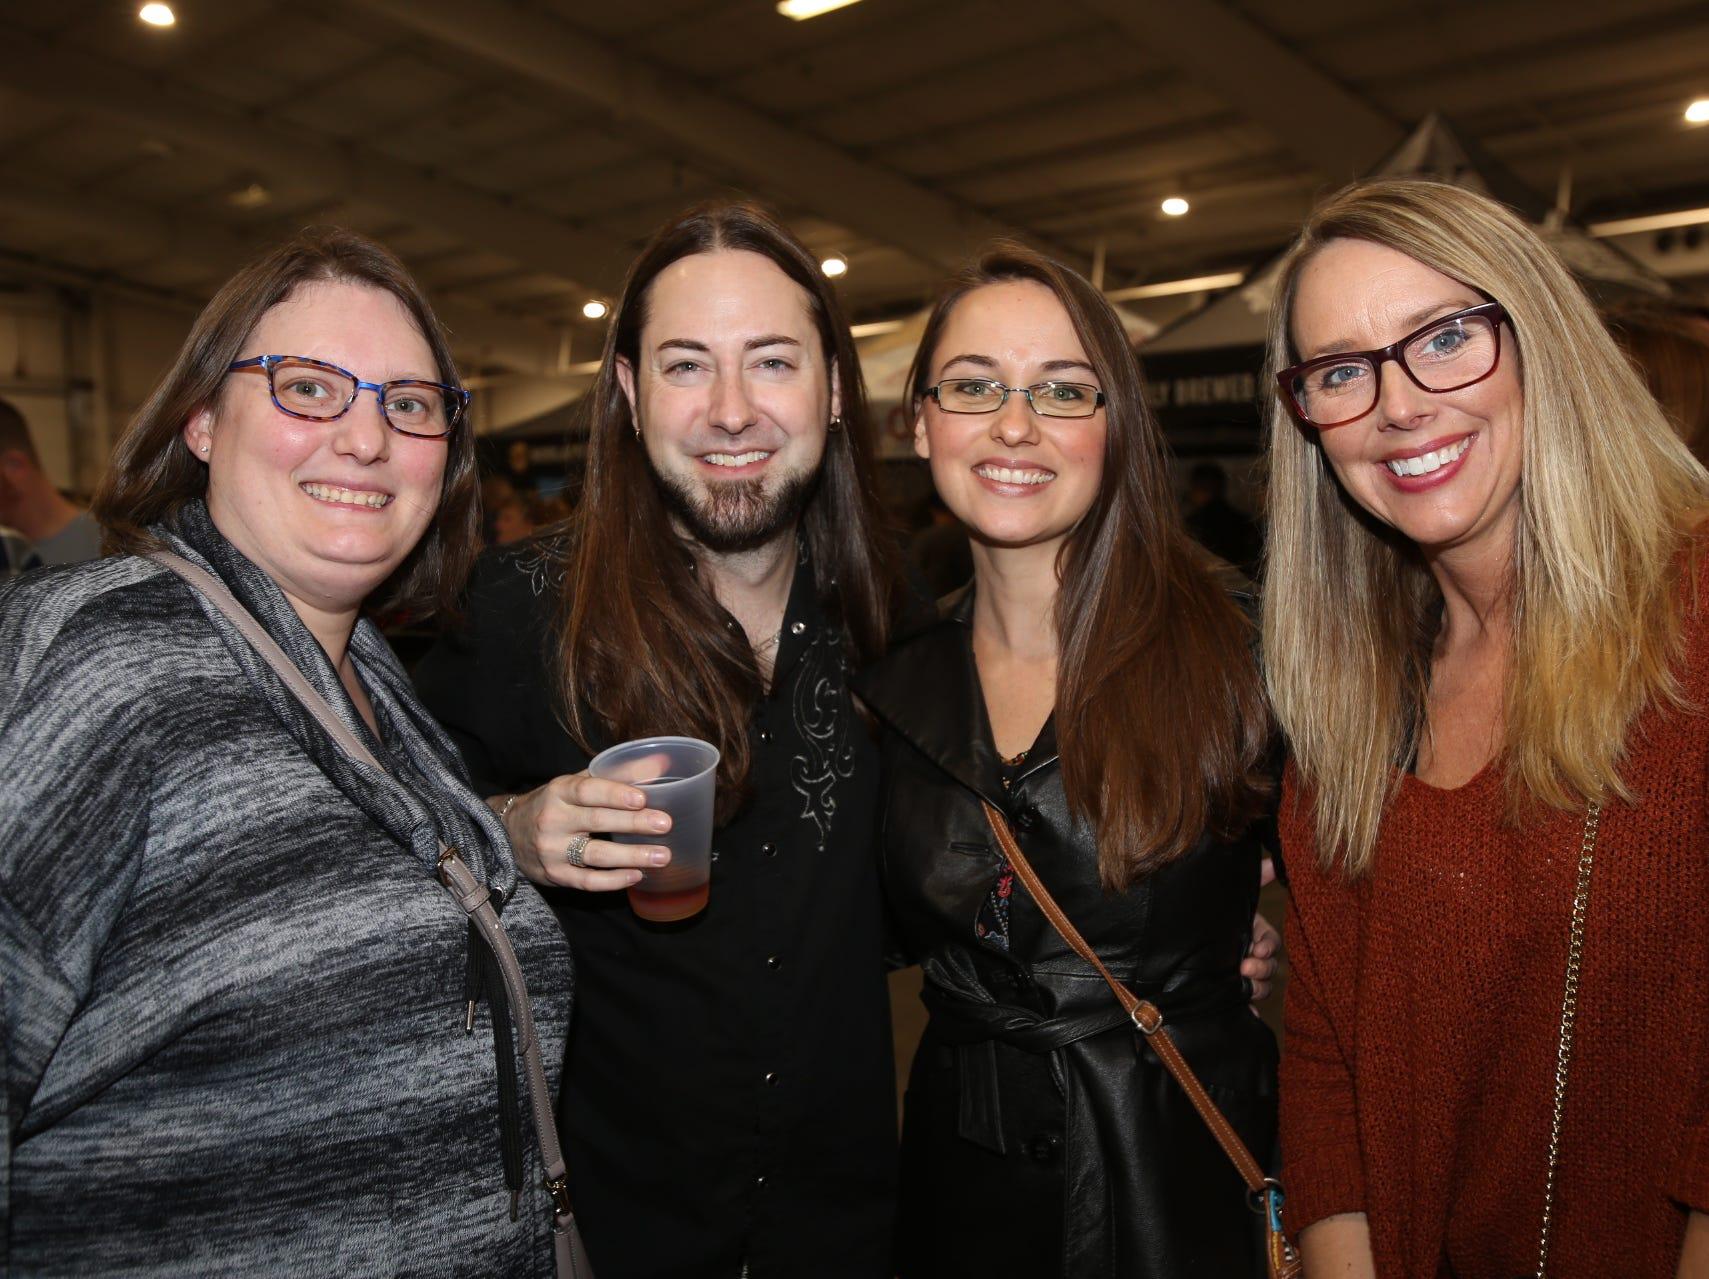 Joy Hendershott, Michael Hitt, Kalie Borders, and Mira McLallen